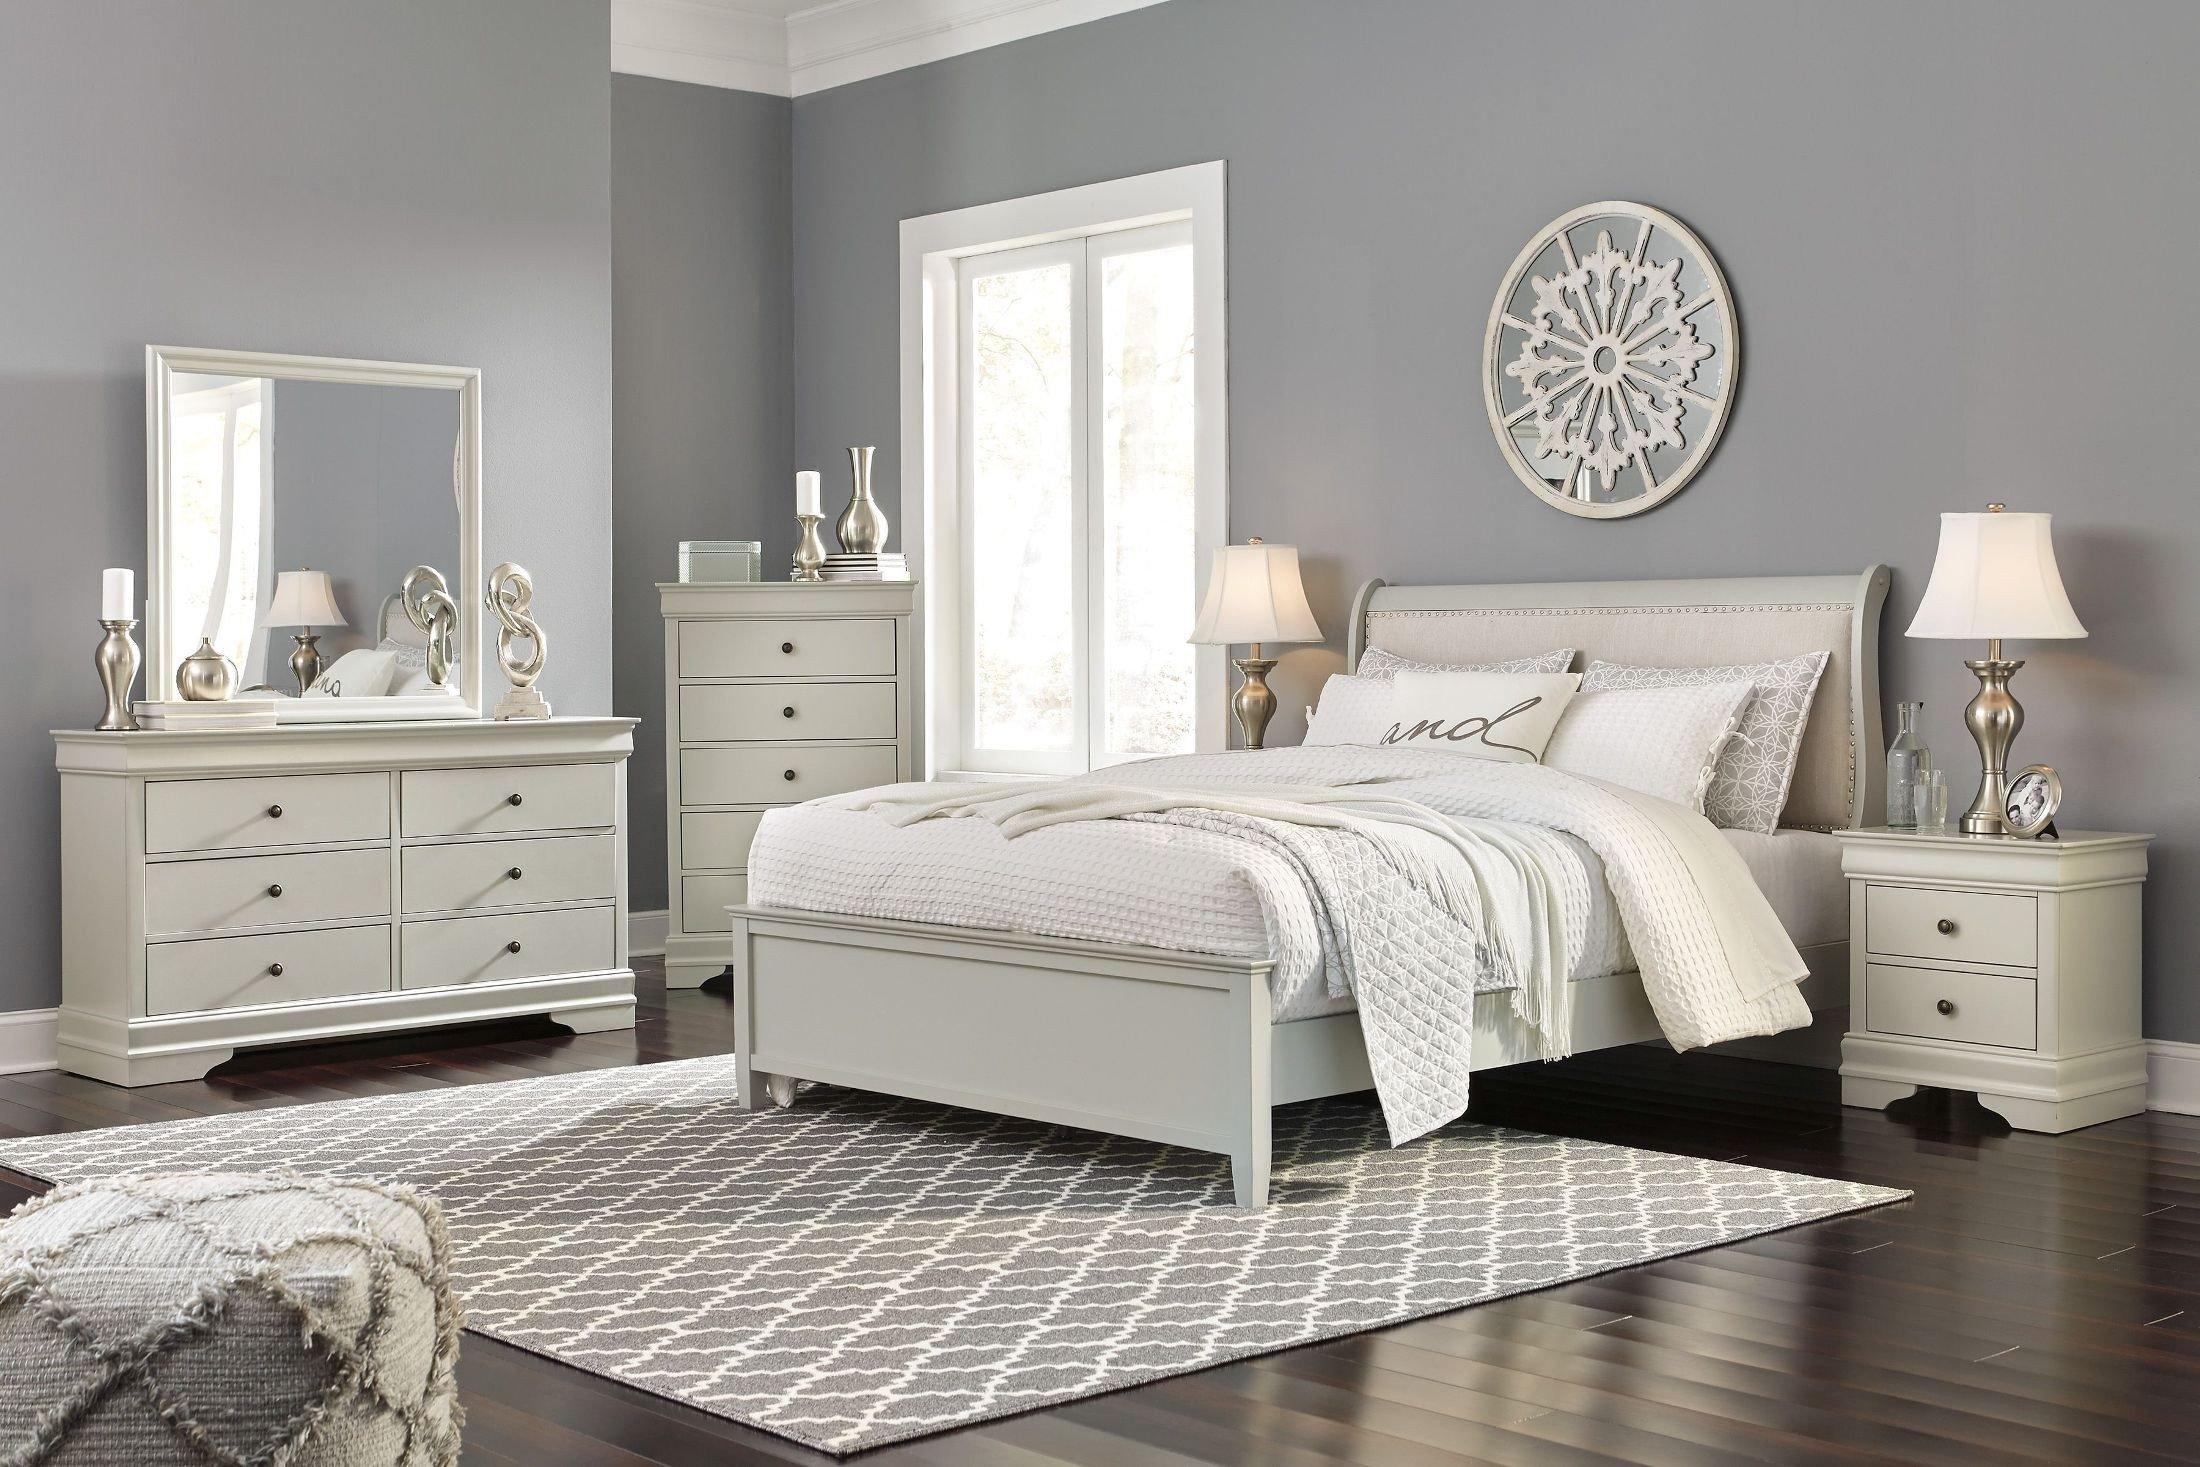 Tufted King Bedroom Set New Emma Mason Signature Jarred 5 Piece Sleigh Bedroom Set In Gray